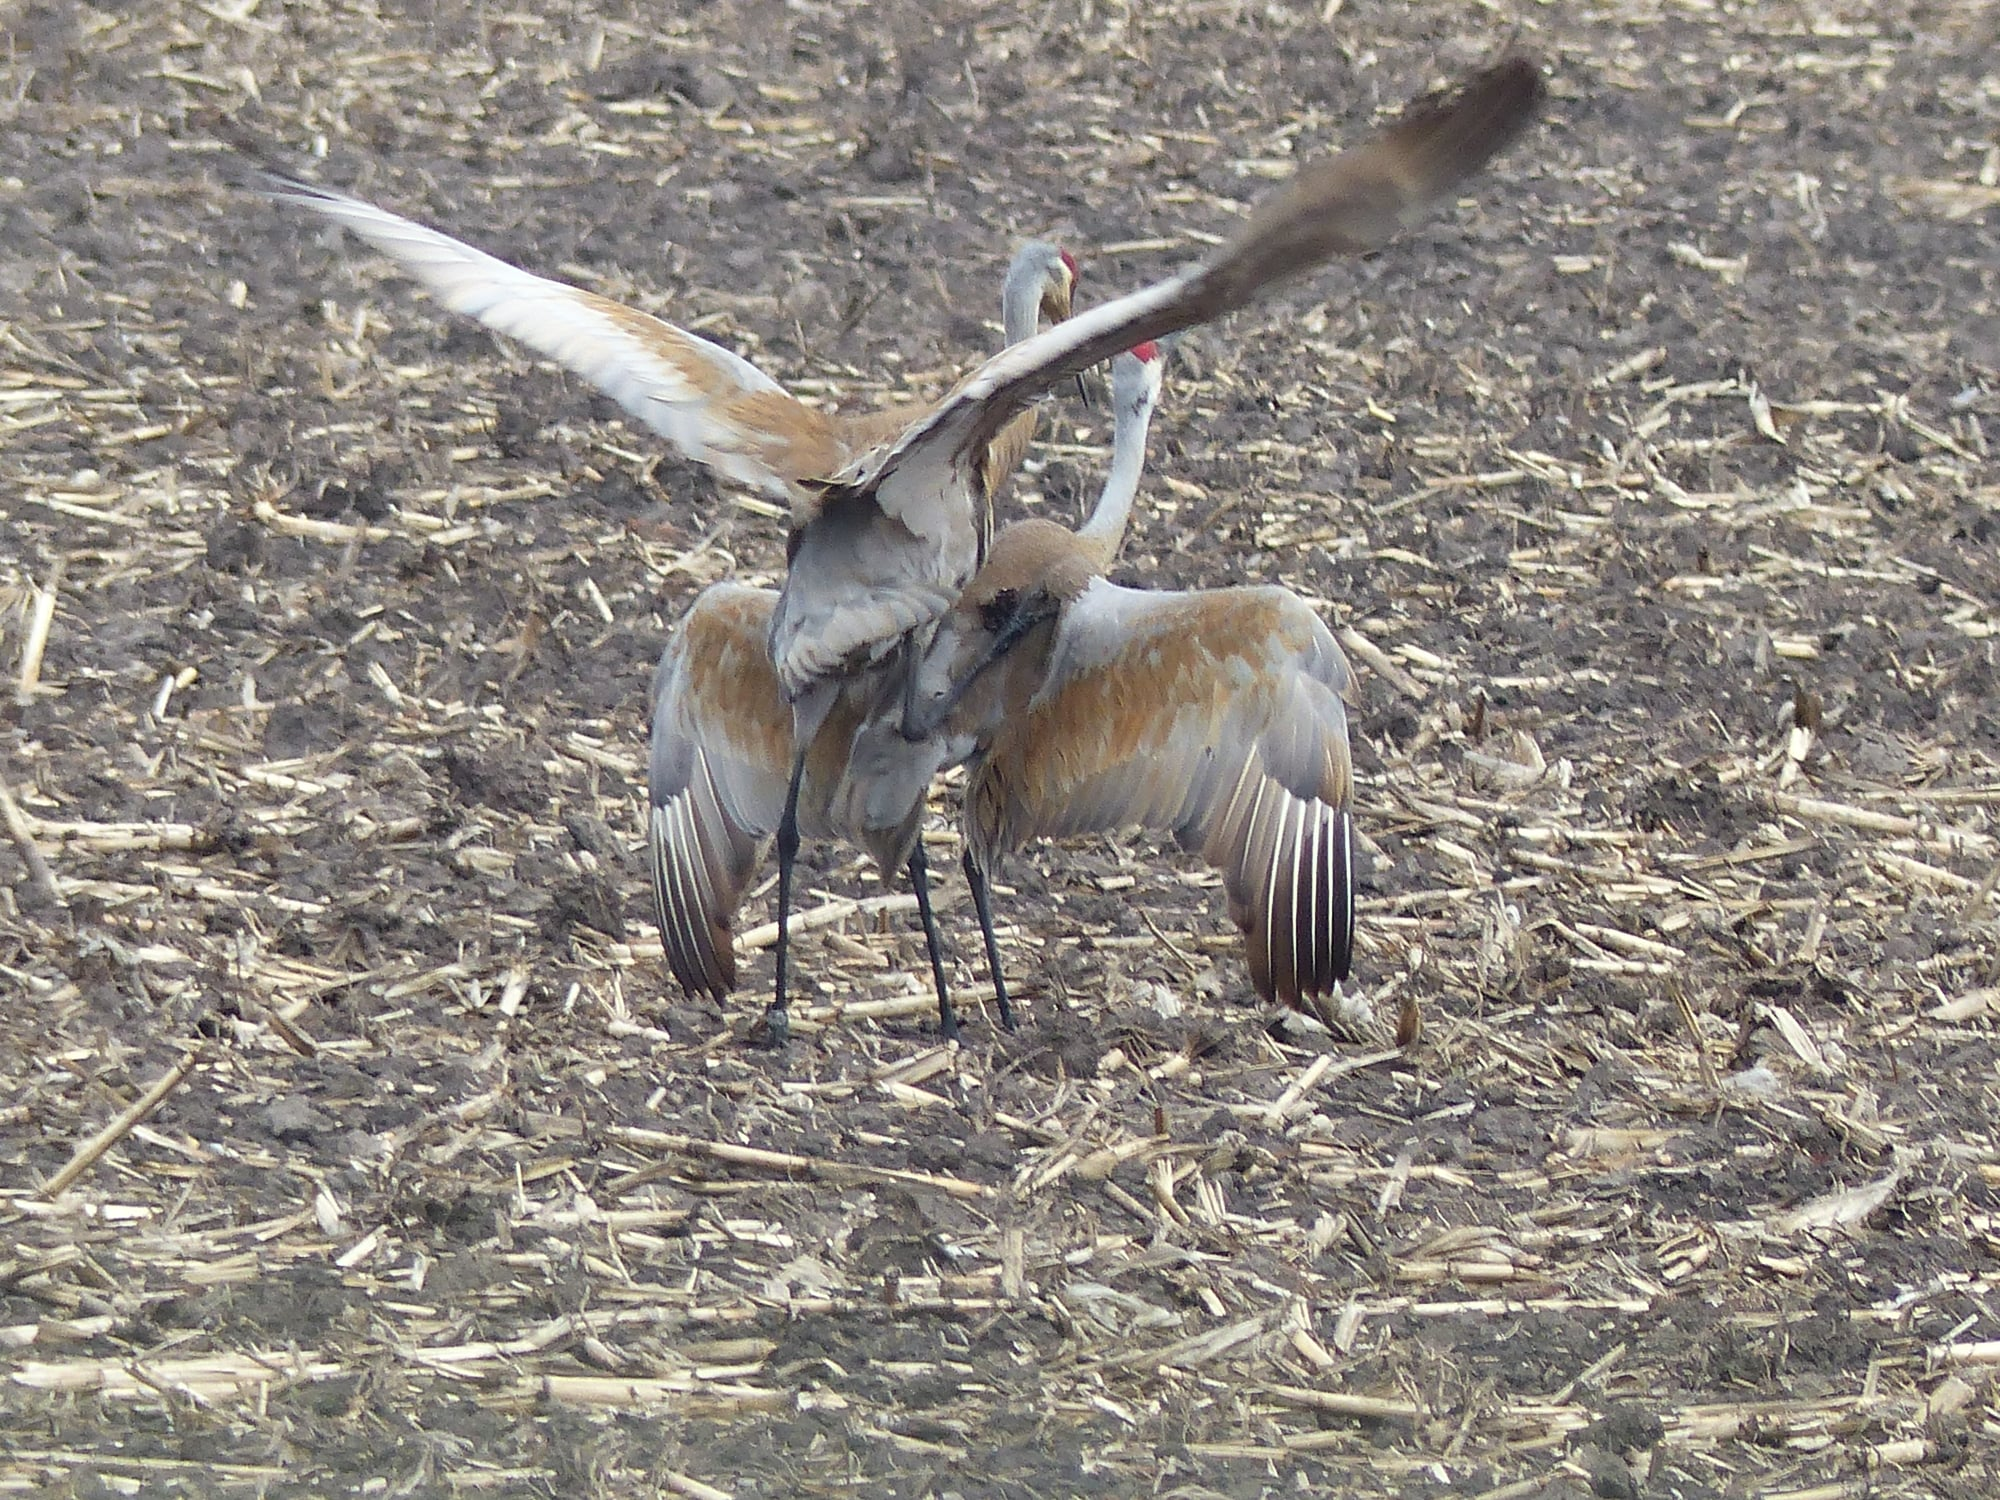 Sandhill cranes mating in Kane County. Credit: John Heneghan